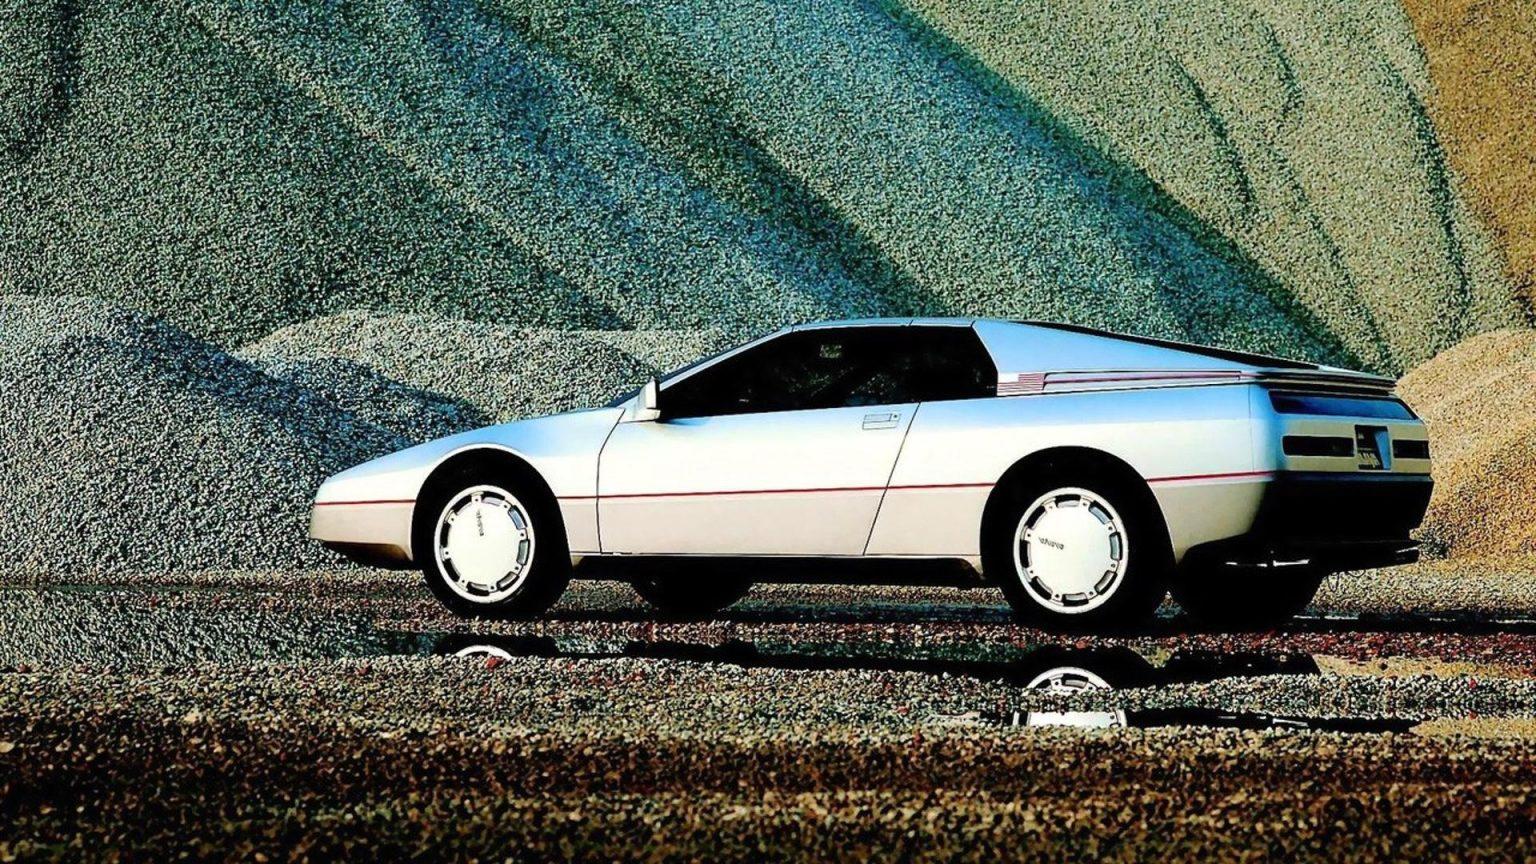 Ford Maya Concept